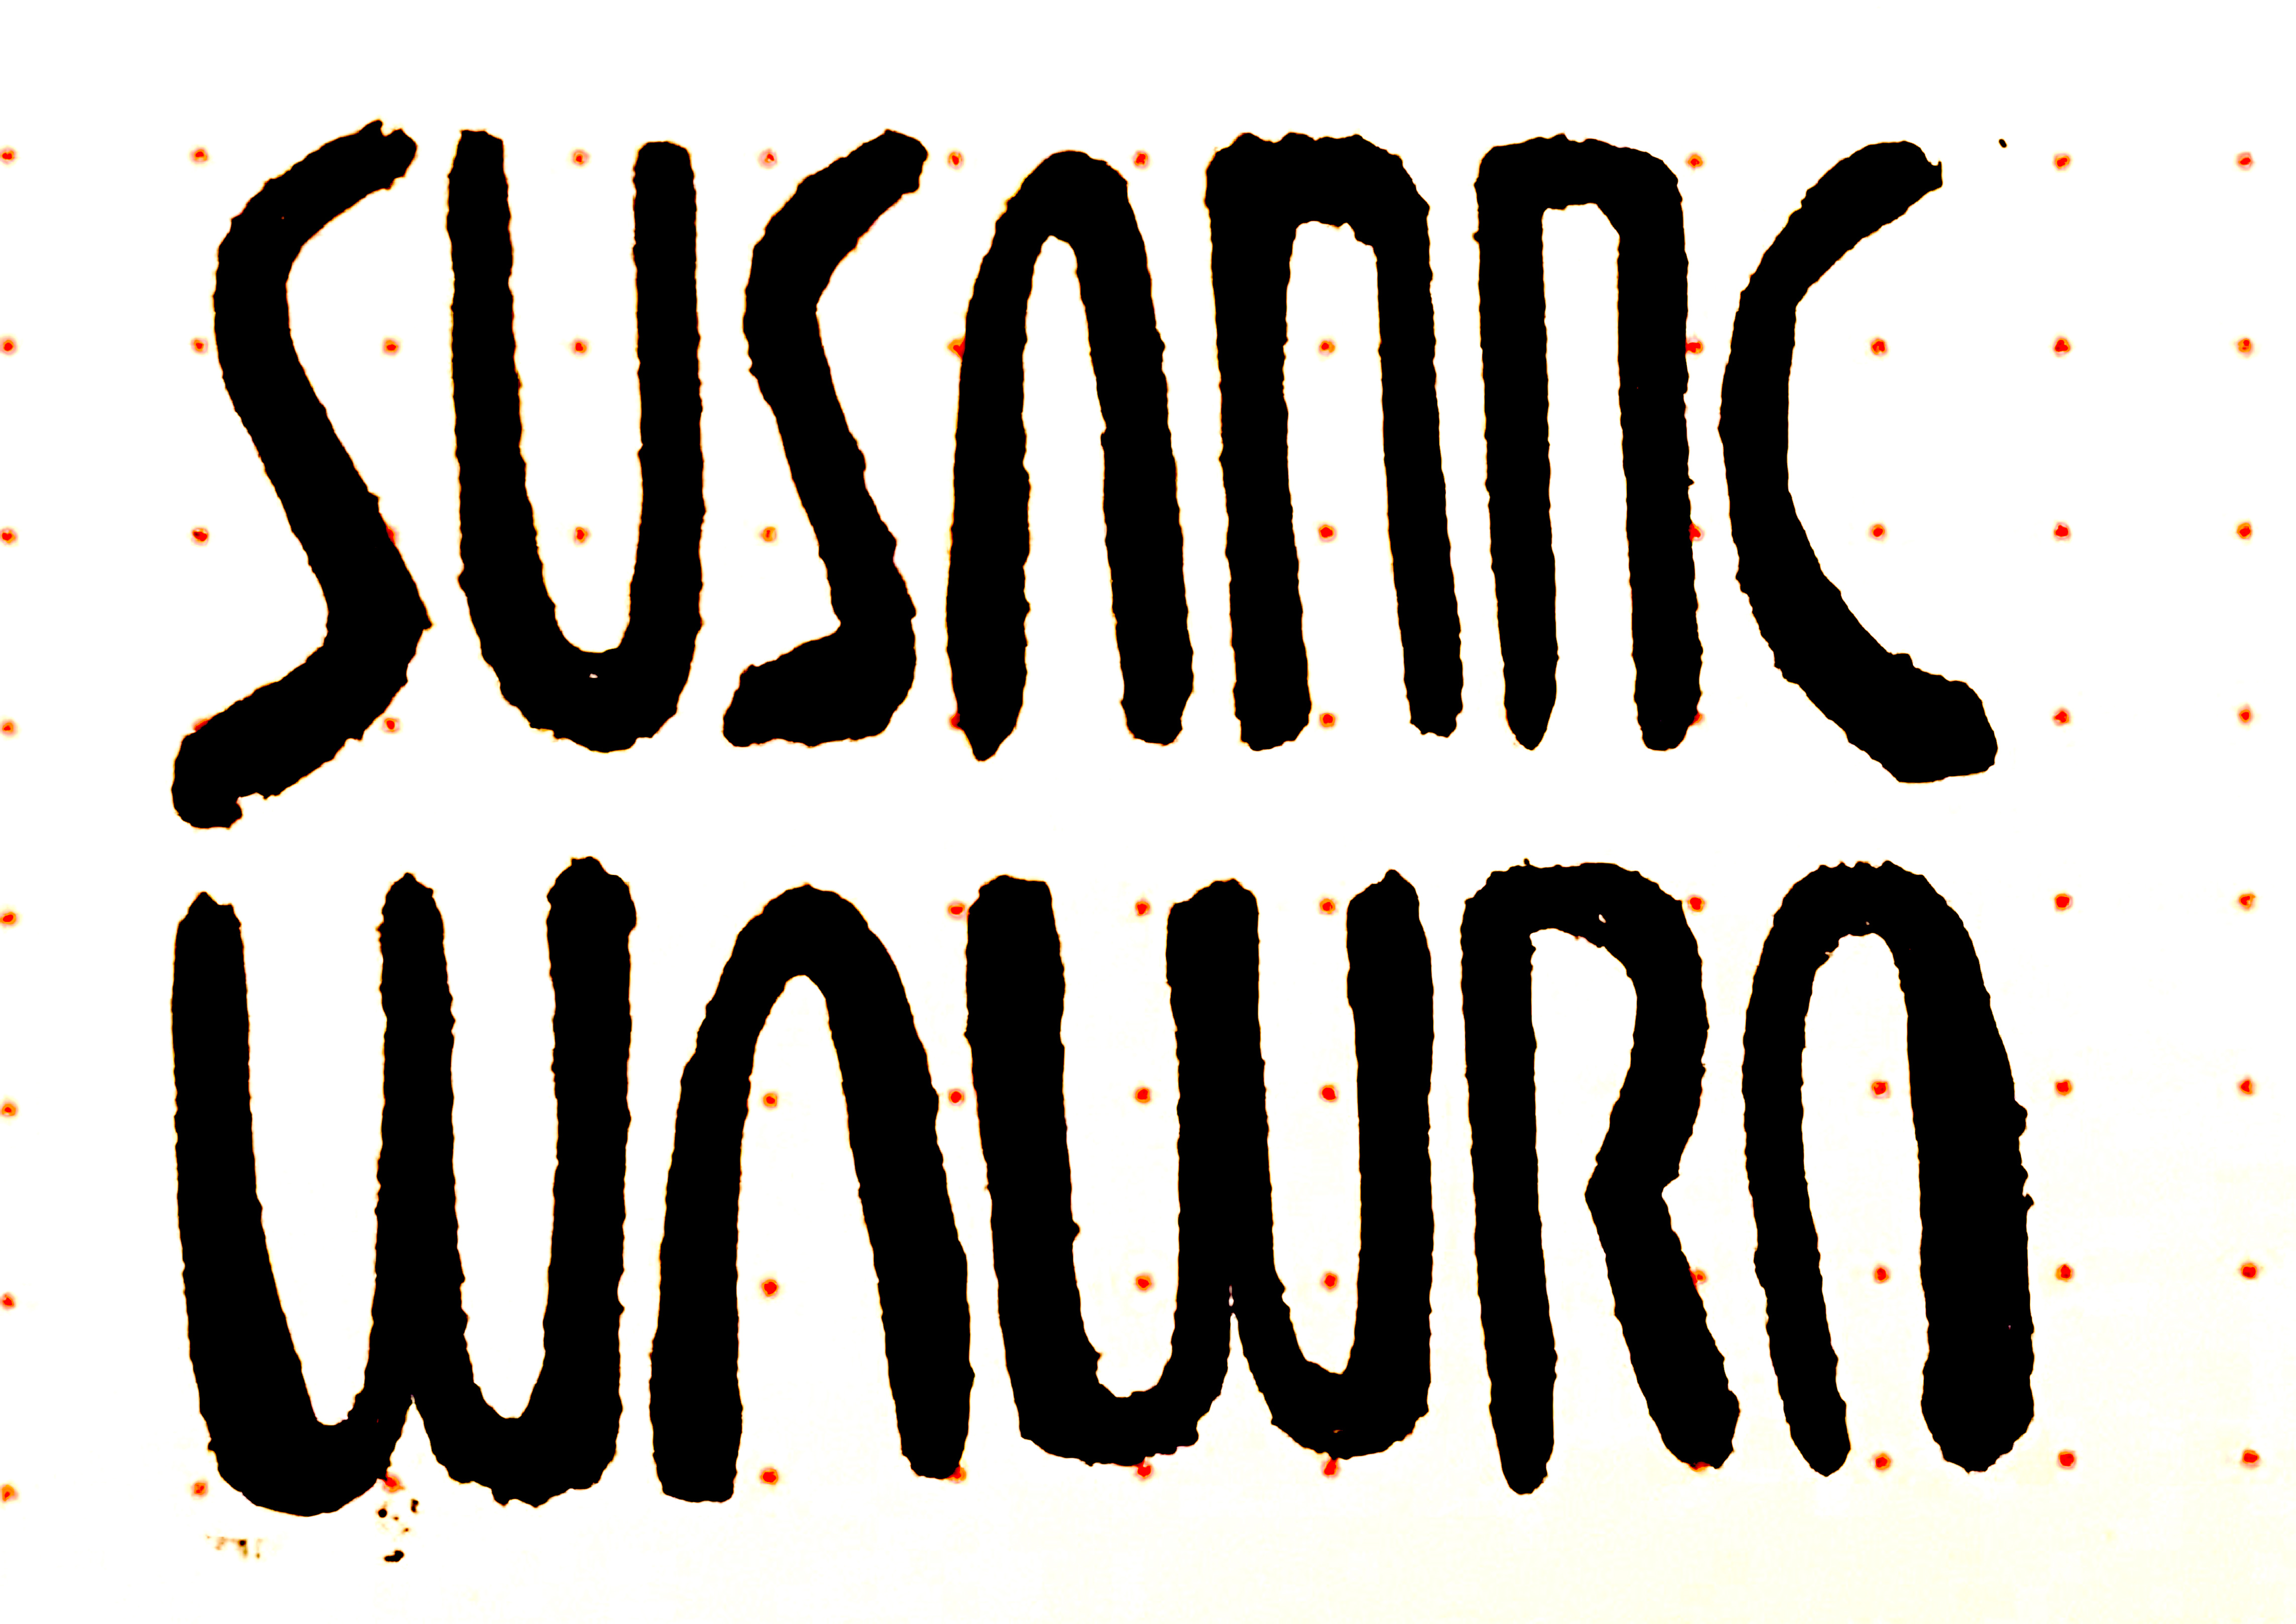 Susanne Wawra's Signature